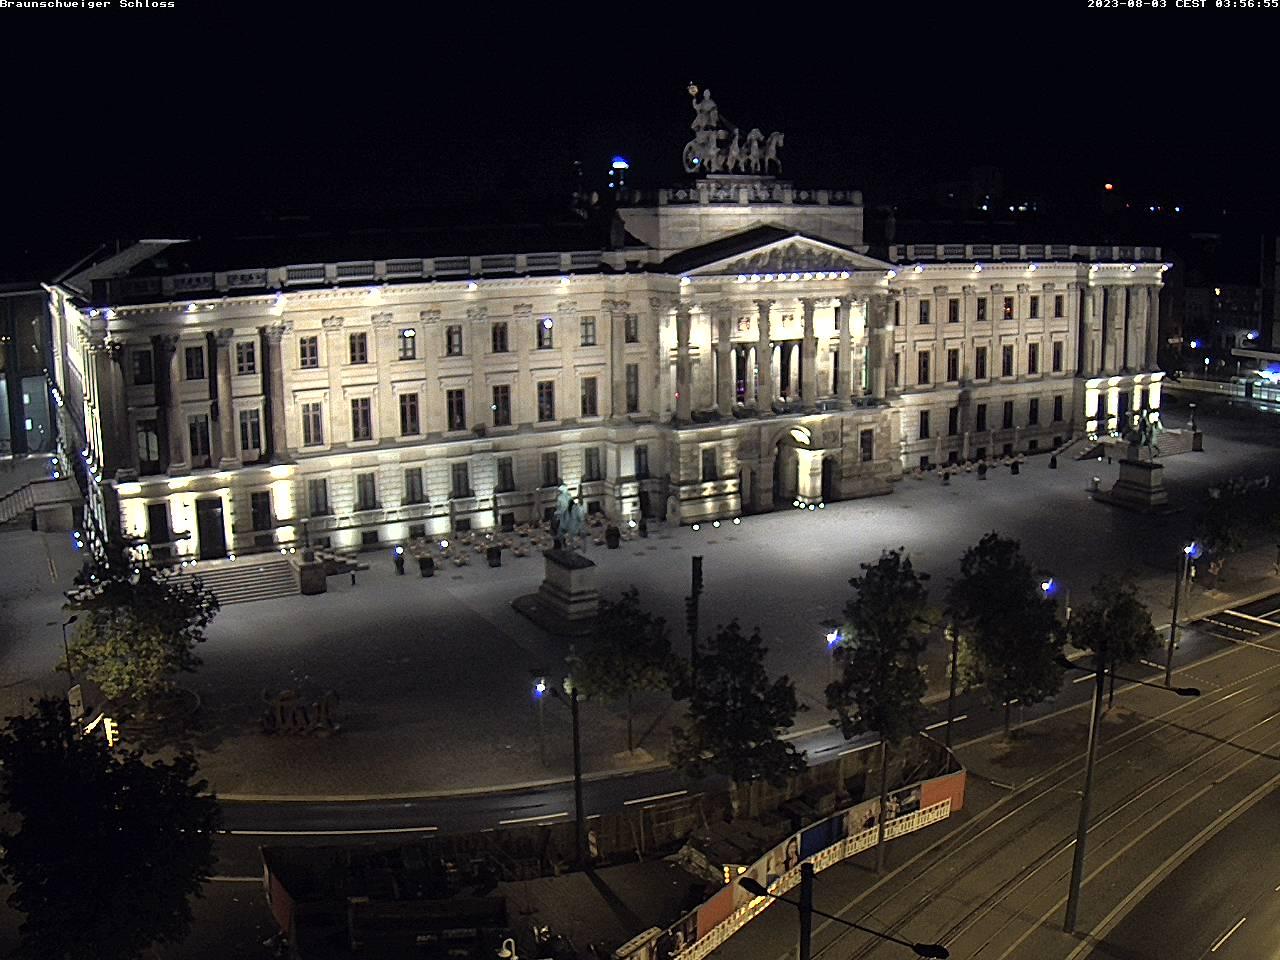 Webcam Braunschweig